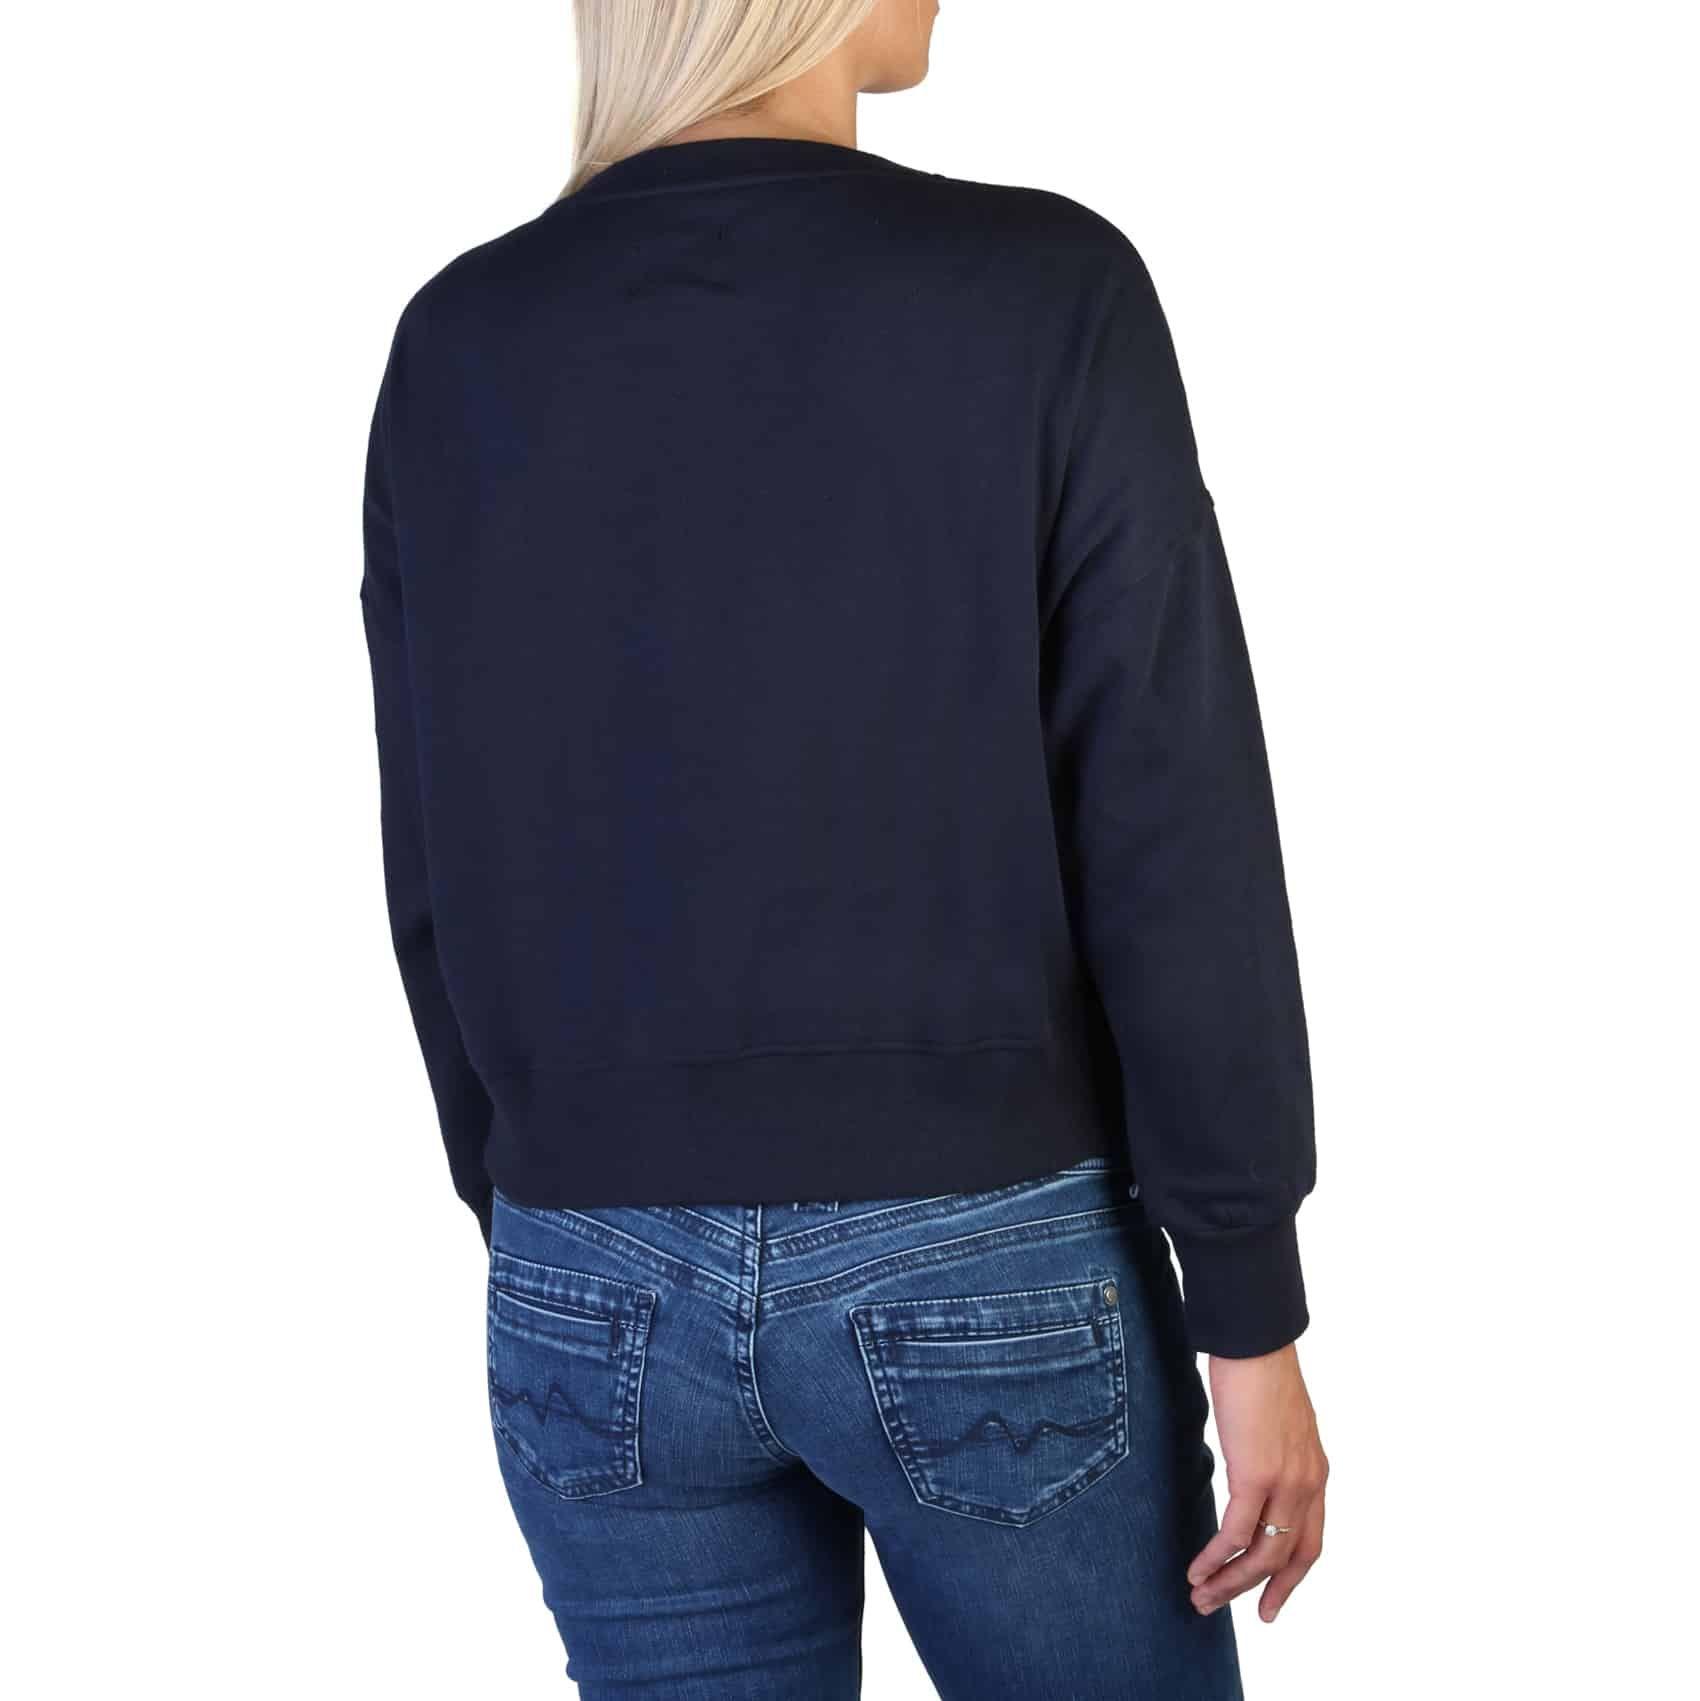 Pepe Jeans – JUNE_PL580758 – Azul